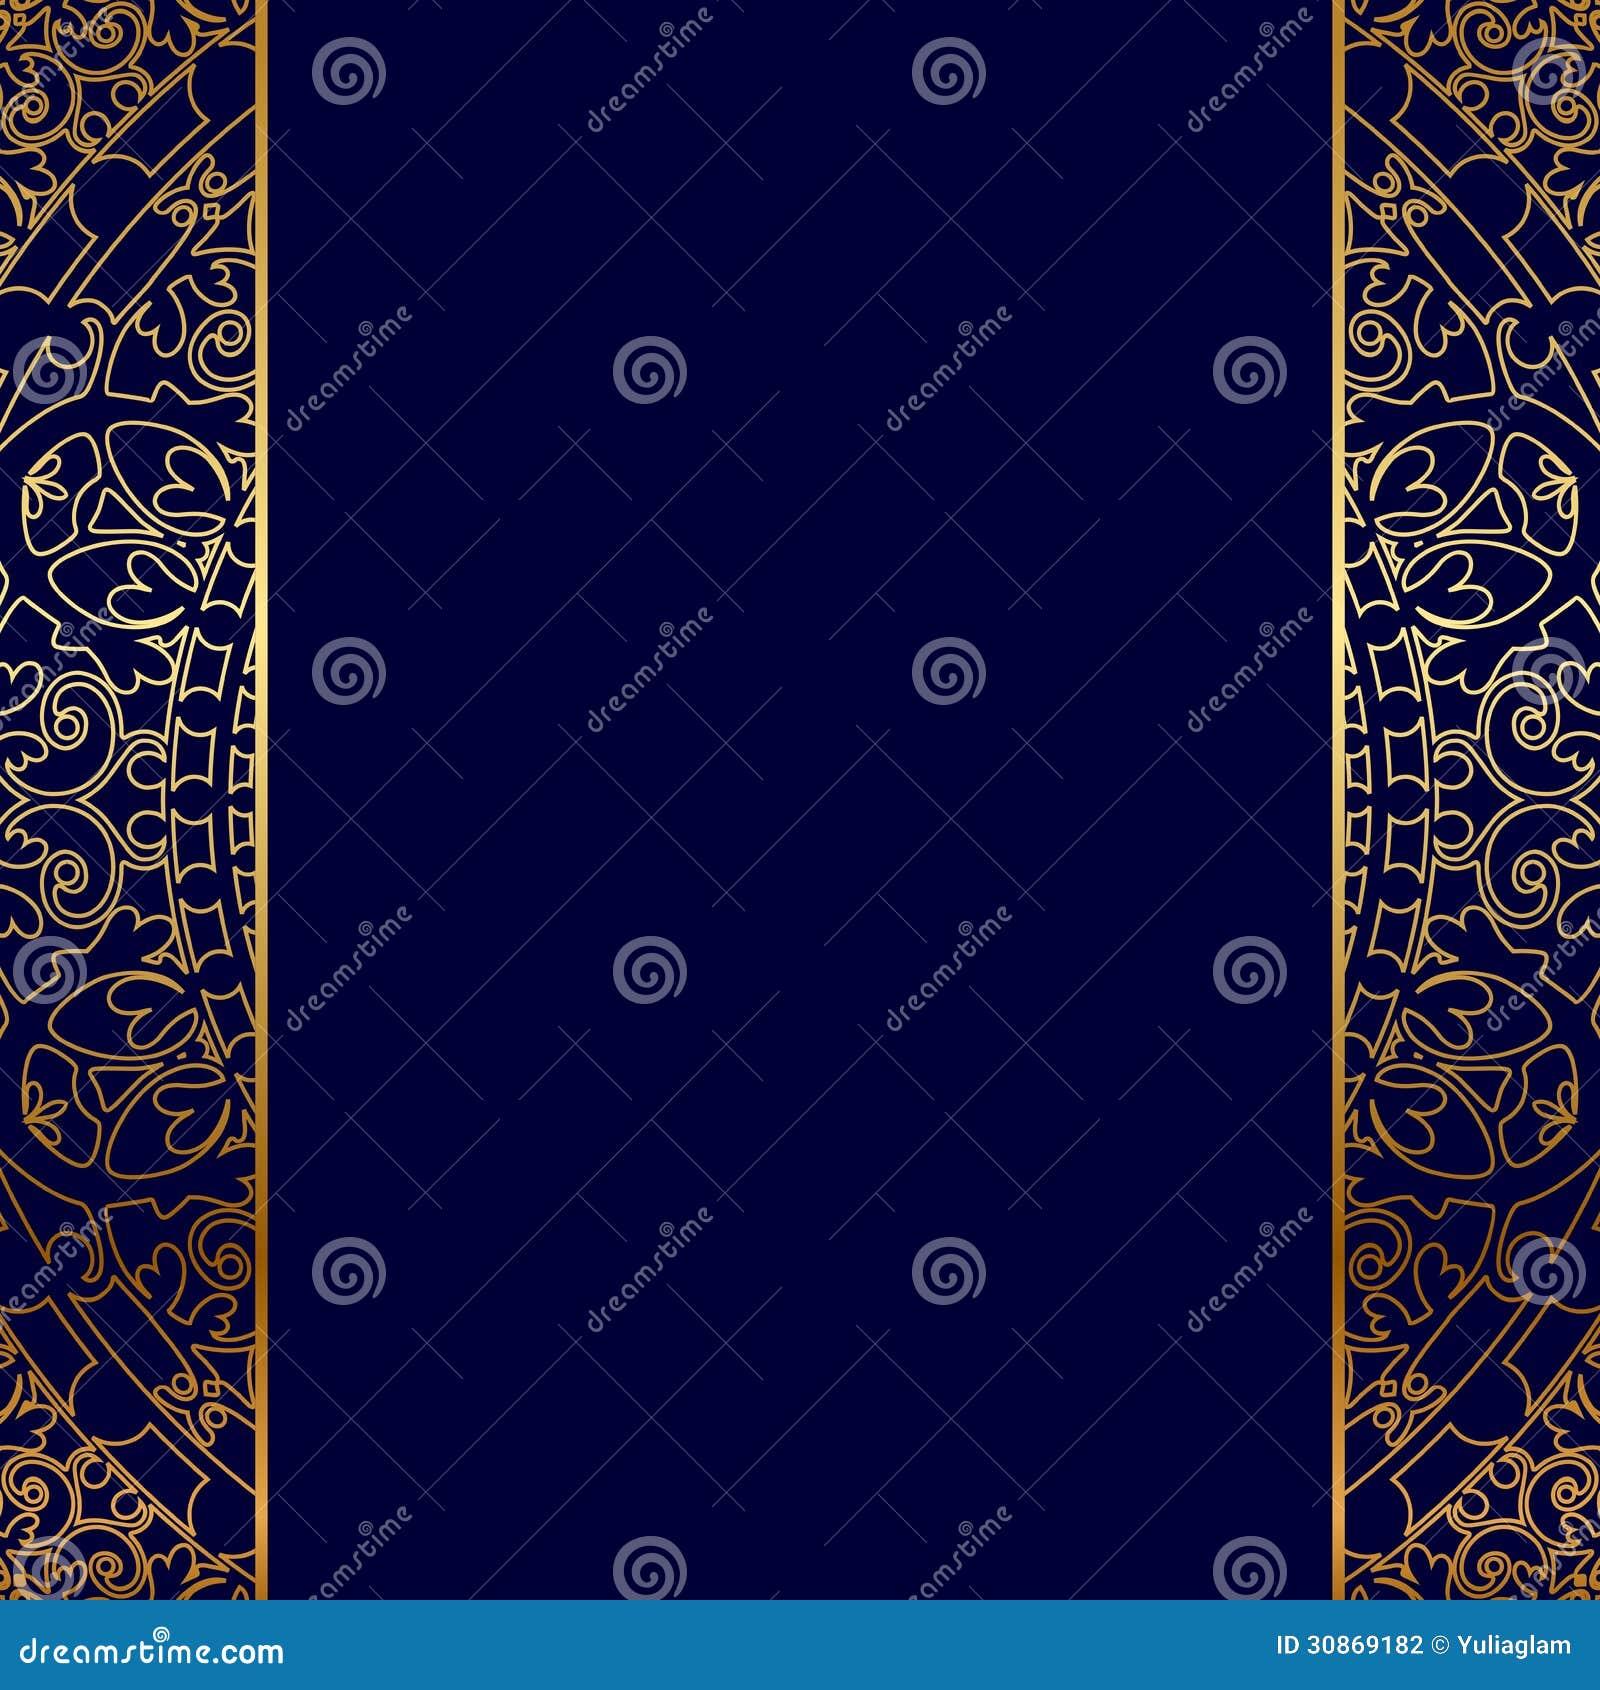 Gold Ornate Border Stock Photography Image 30869182